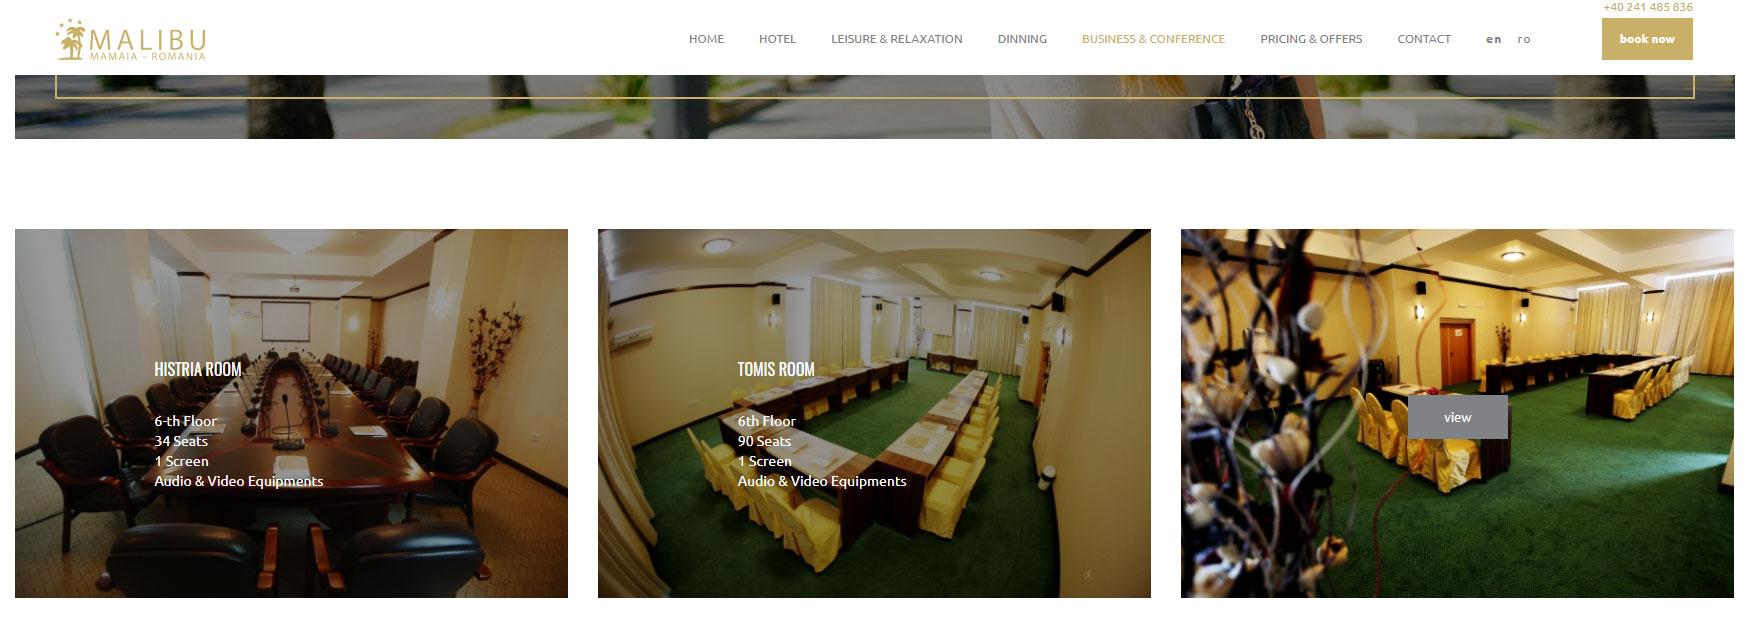 Hotel-Malibu-Web-Development